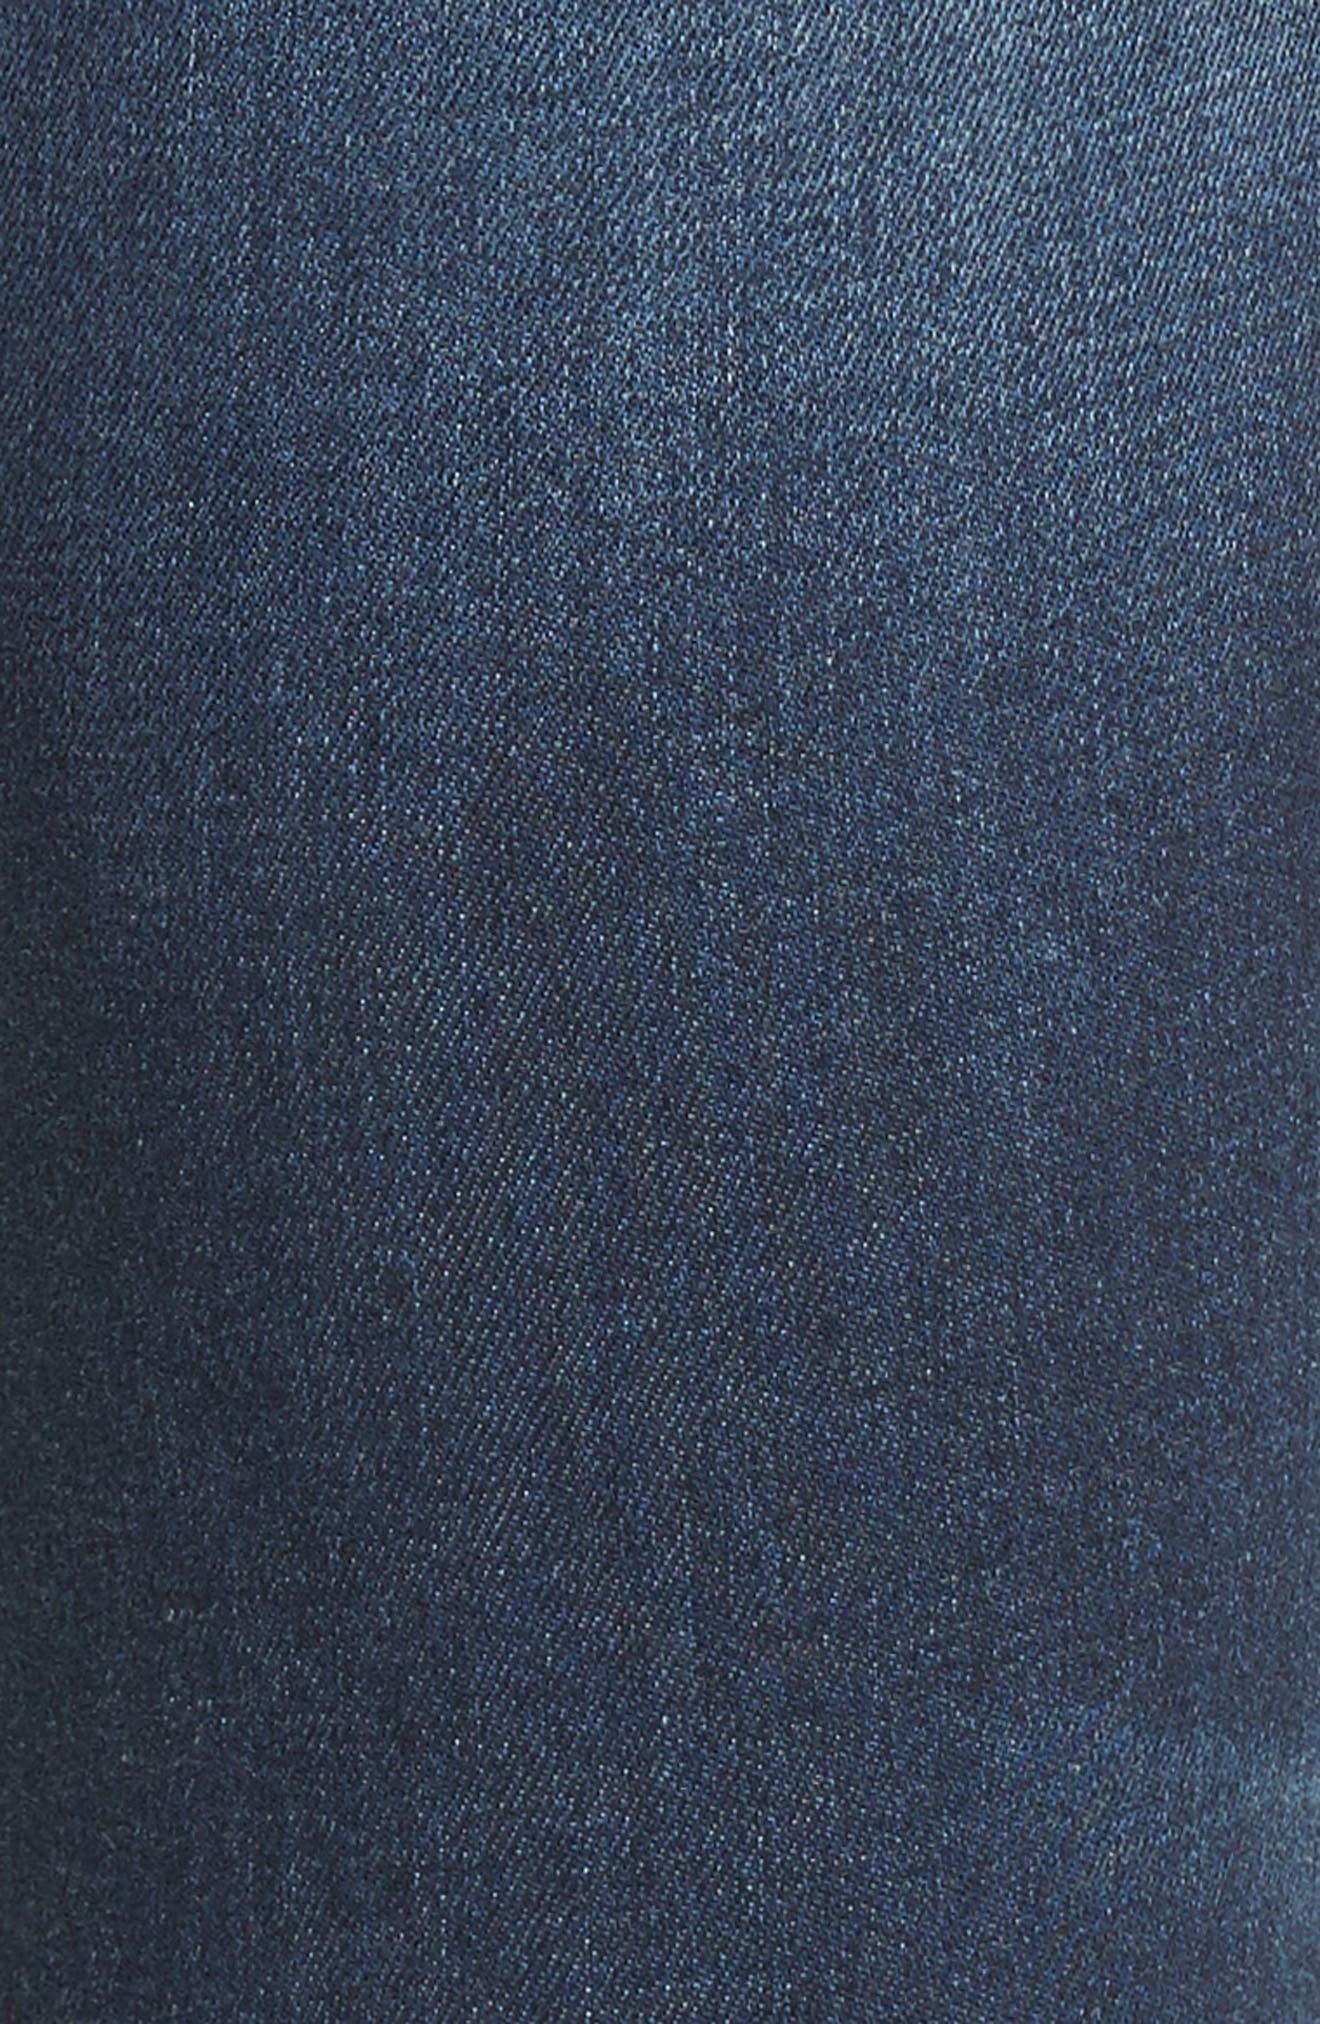 Jagger Distressed Skinny Jeans,                             Alternate thumbnail 5, color,                             Dark Wash